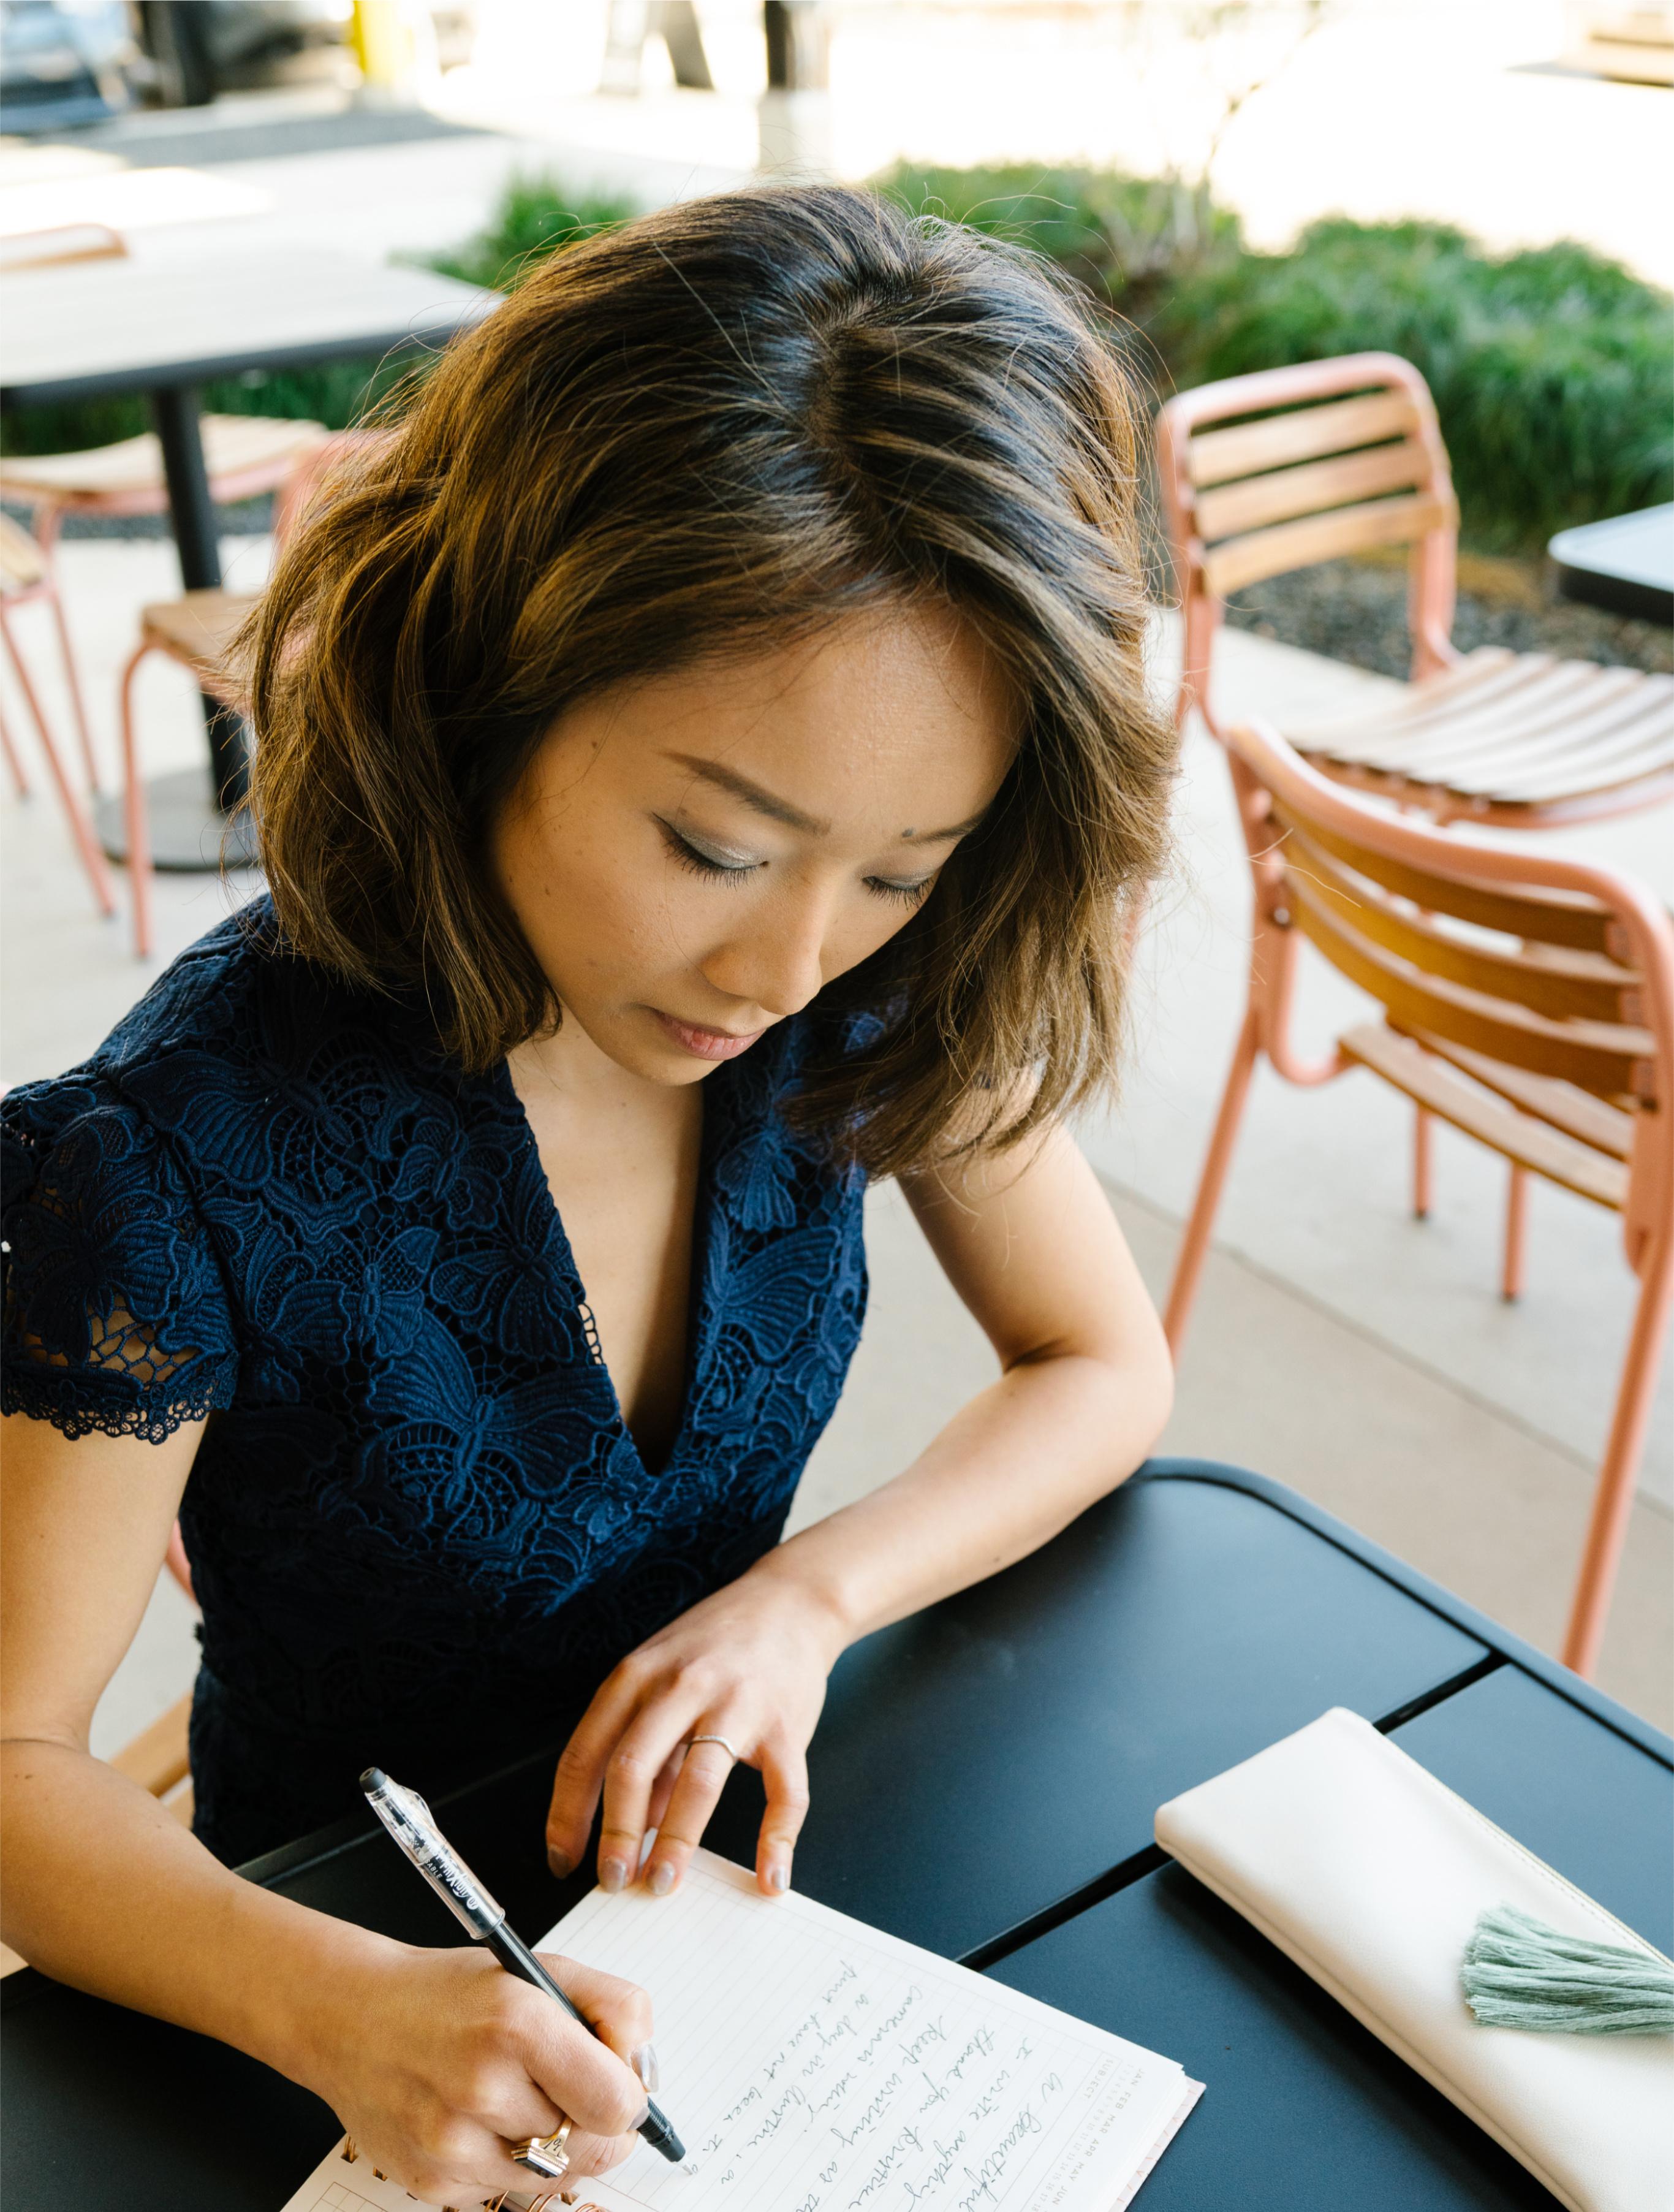 Allison Li taking notes